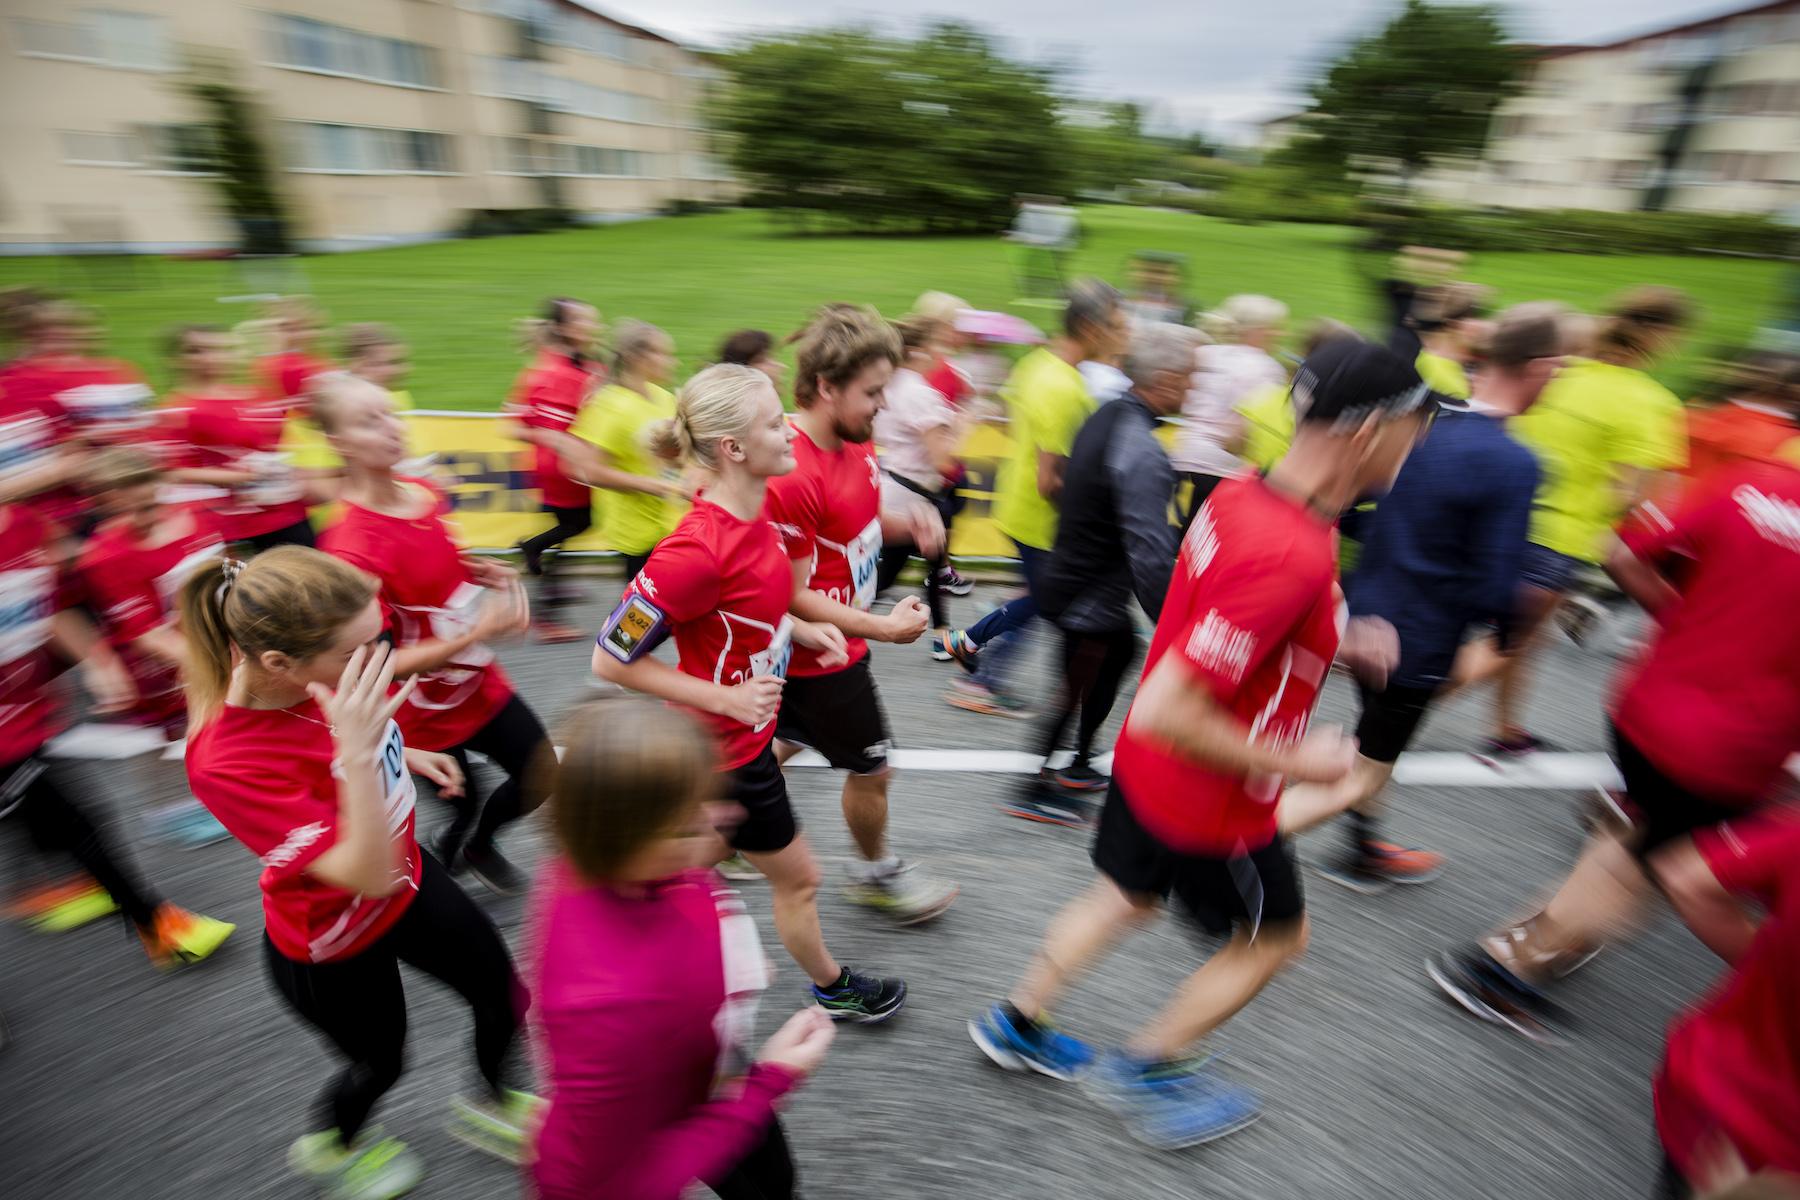 Blodomloppet 2020 Ga Jogga Eller Spring Arets Viktigaste Lopp